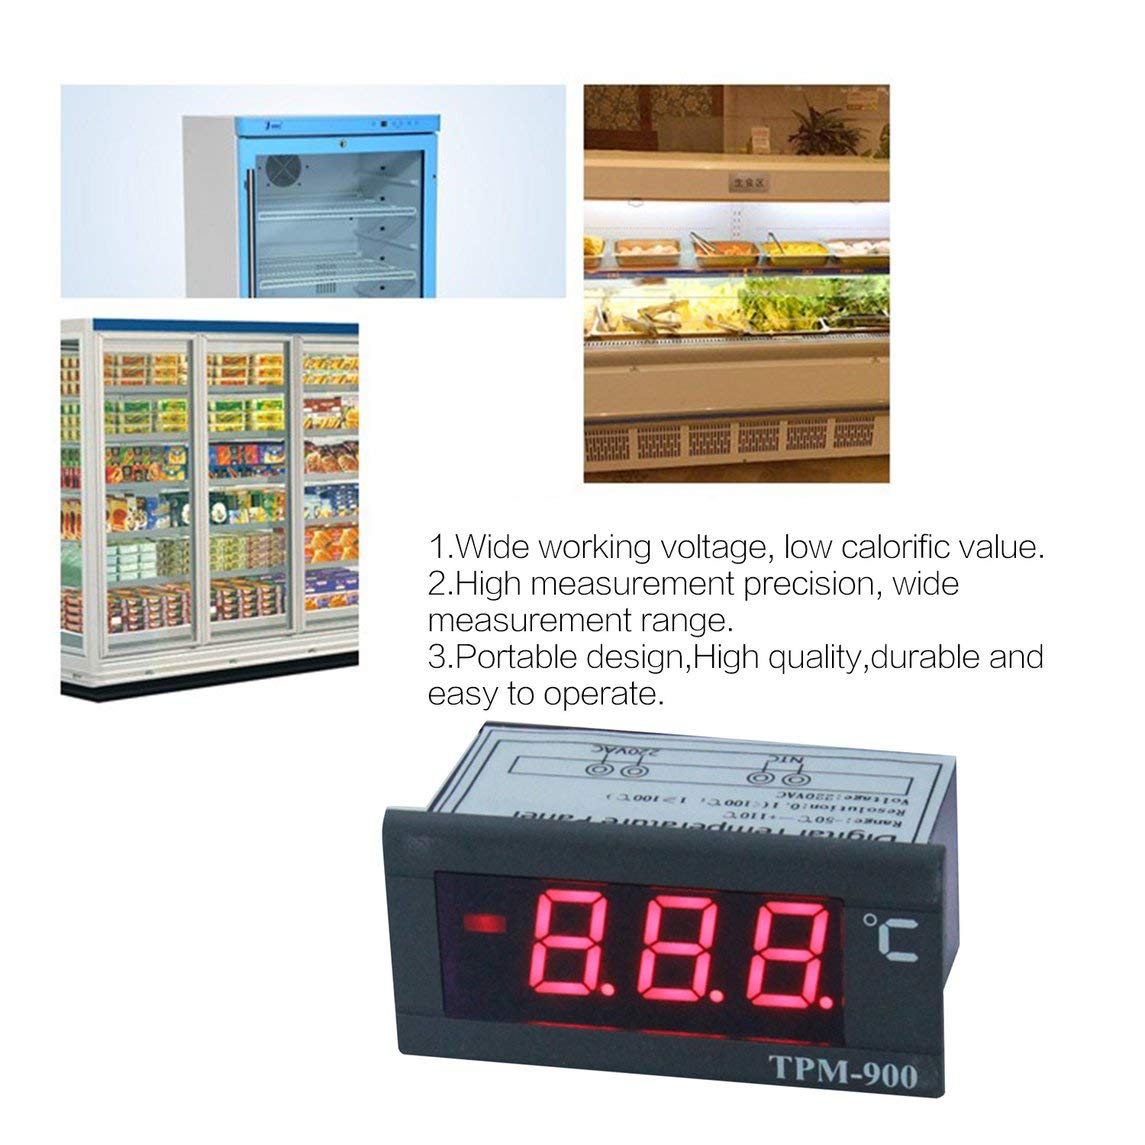 Jasnyfall TPM-80 Refrigerator Digital Electronic Thermometer Display Cabinet Refrigeration Temperature Tester Meter Scarlet Letter noir